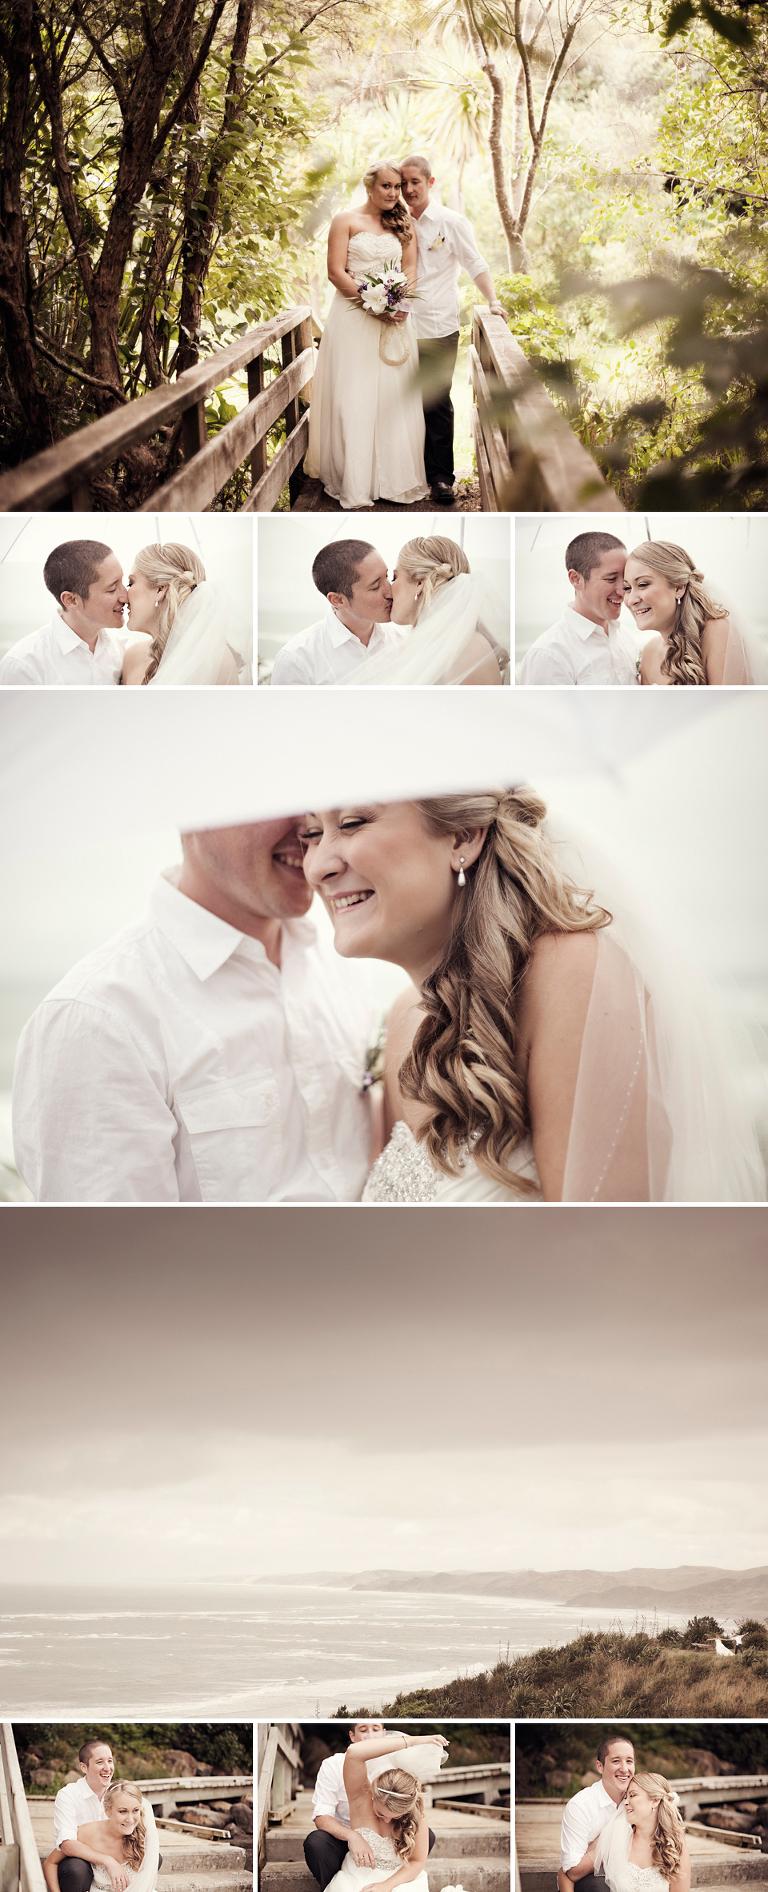 Raglan Beach Wedding Photography - creative portraits